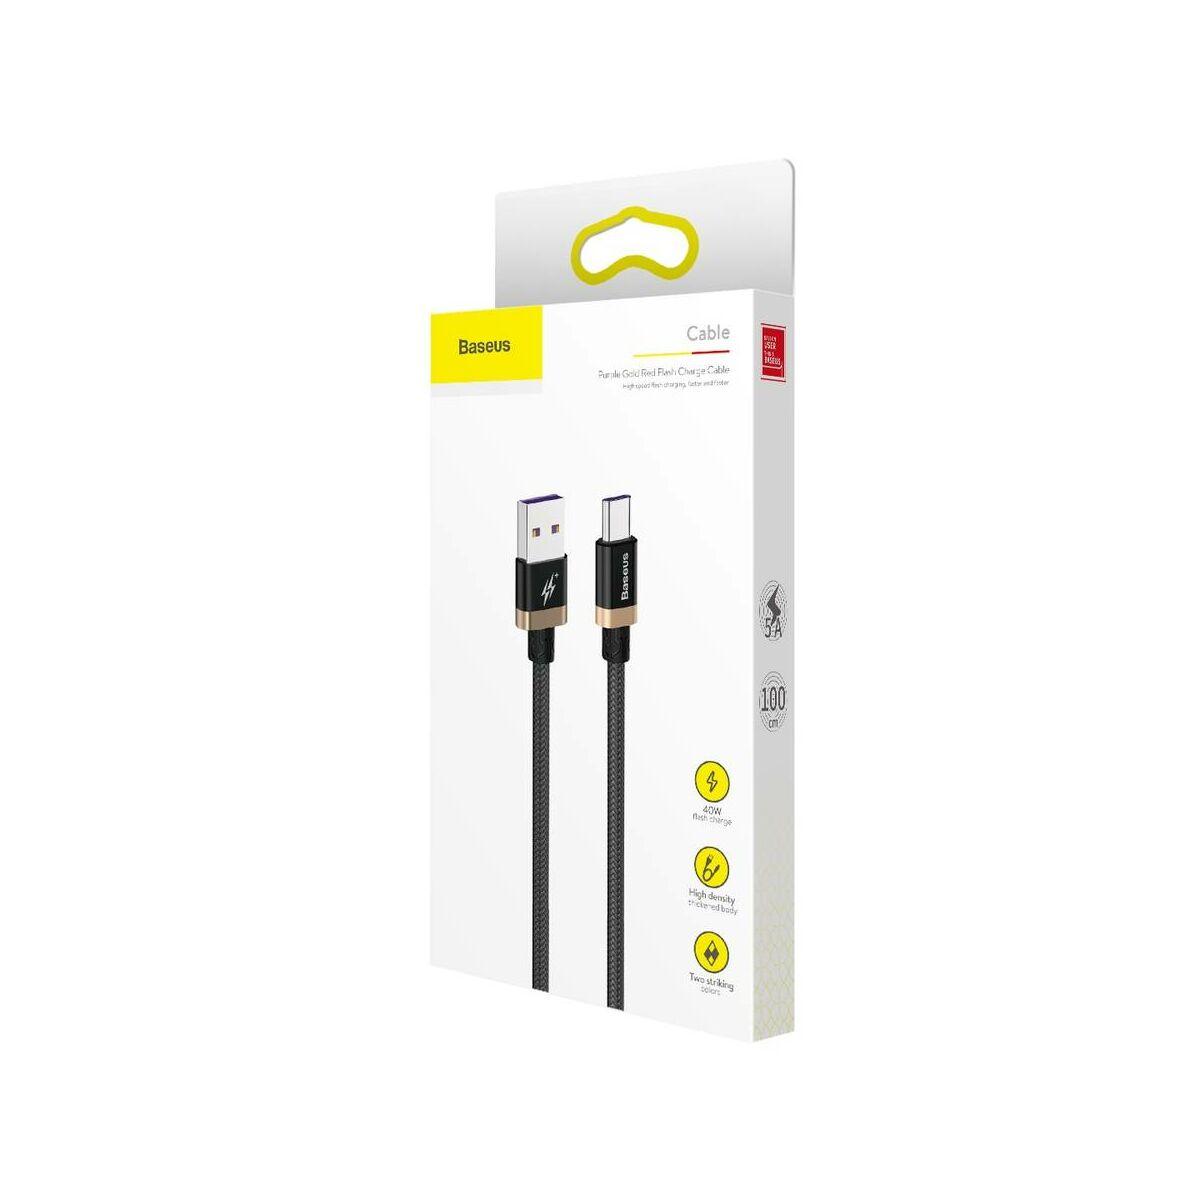 Baseus Type-C HW gyors töltő cable 40W 1m, arany/fekete (CATZH-AV1)